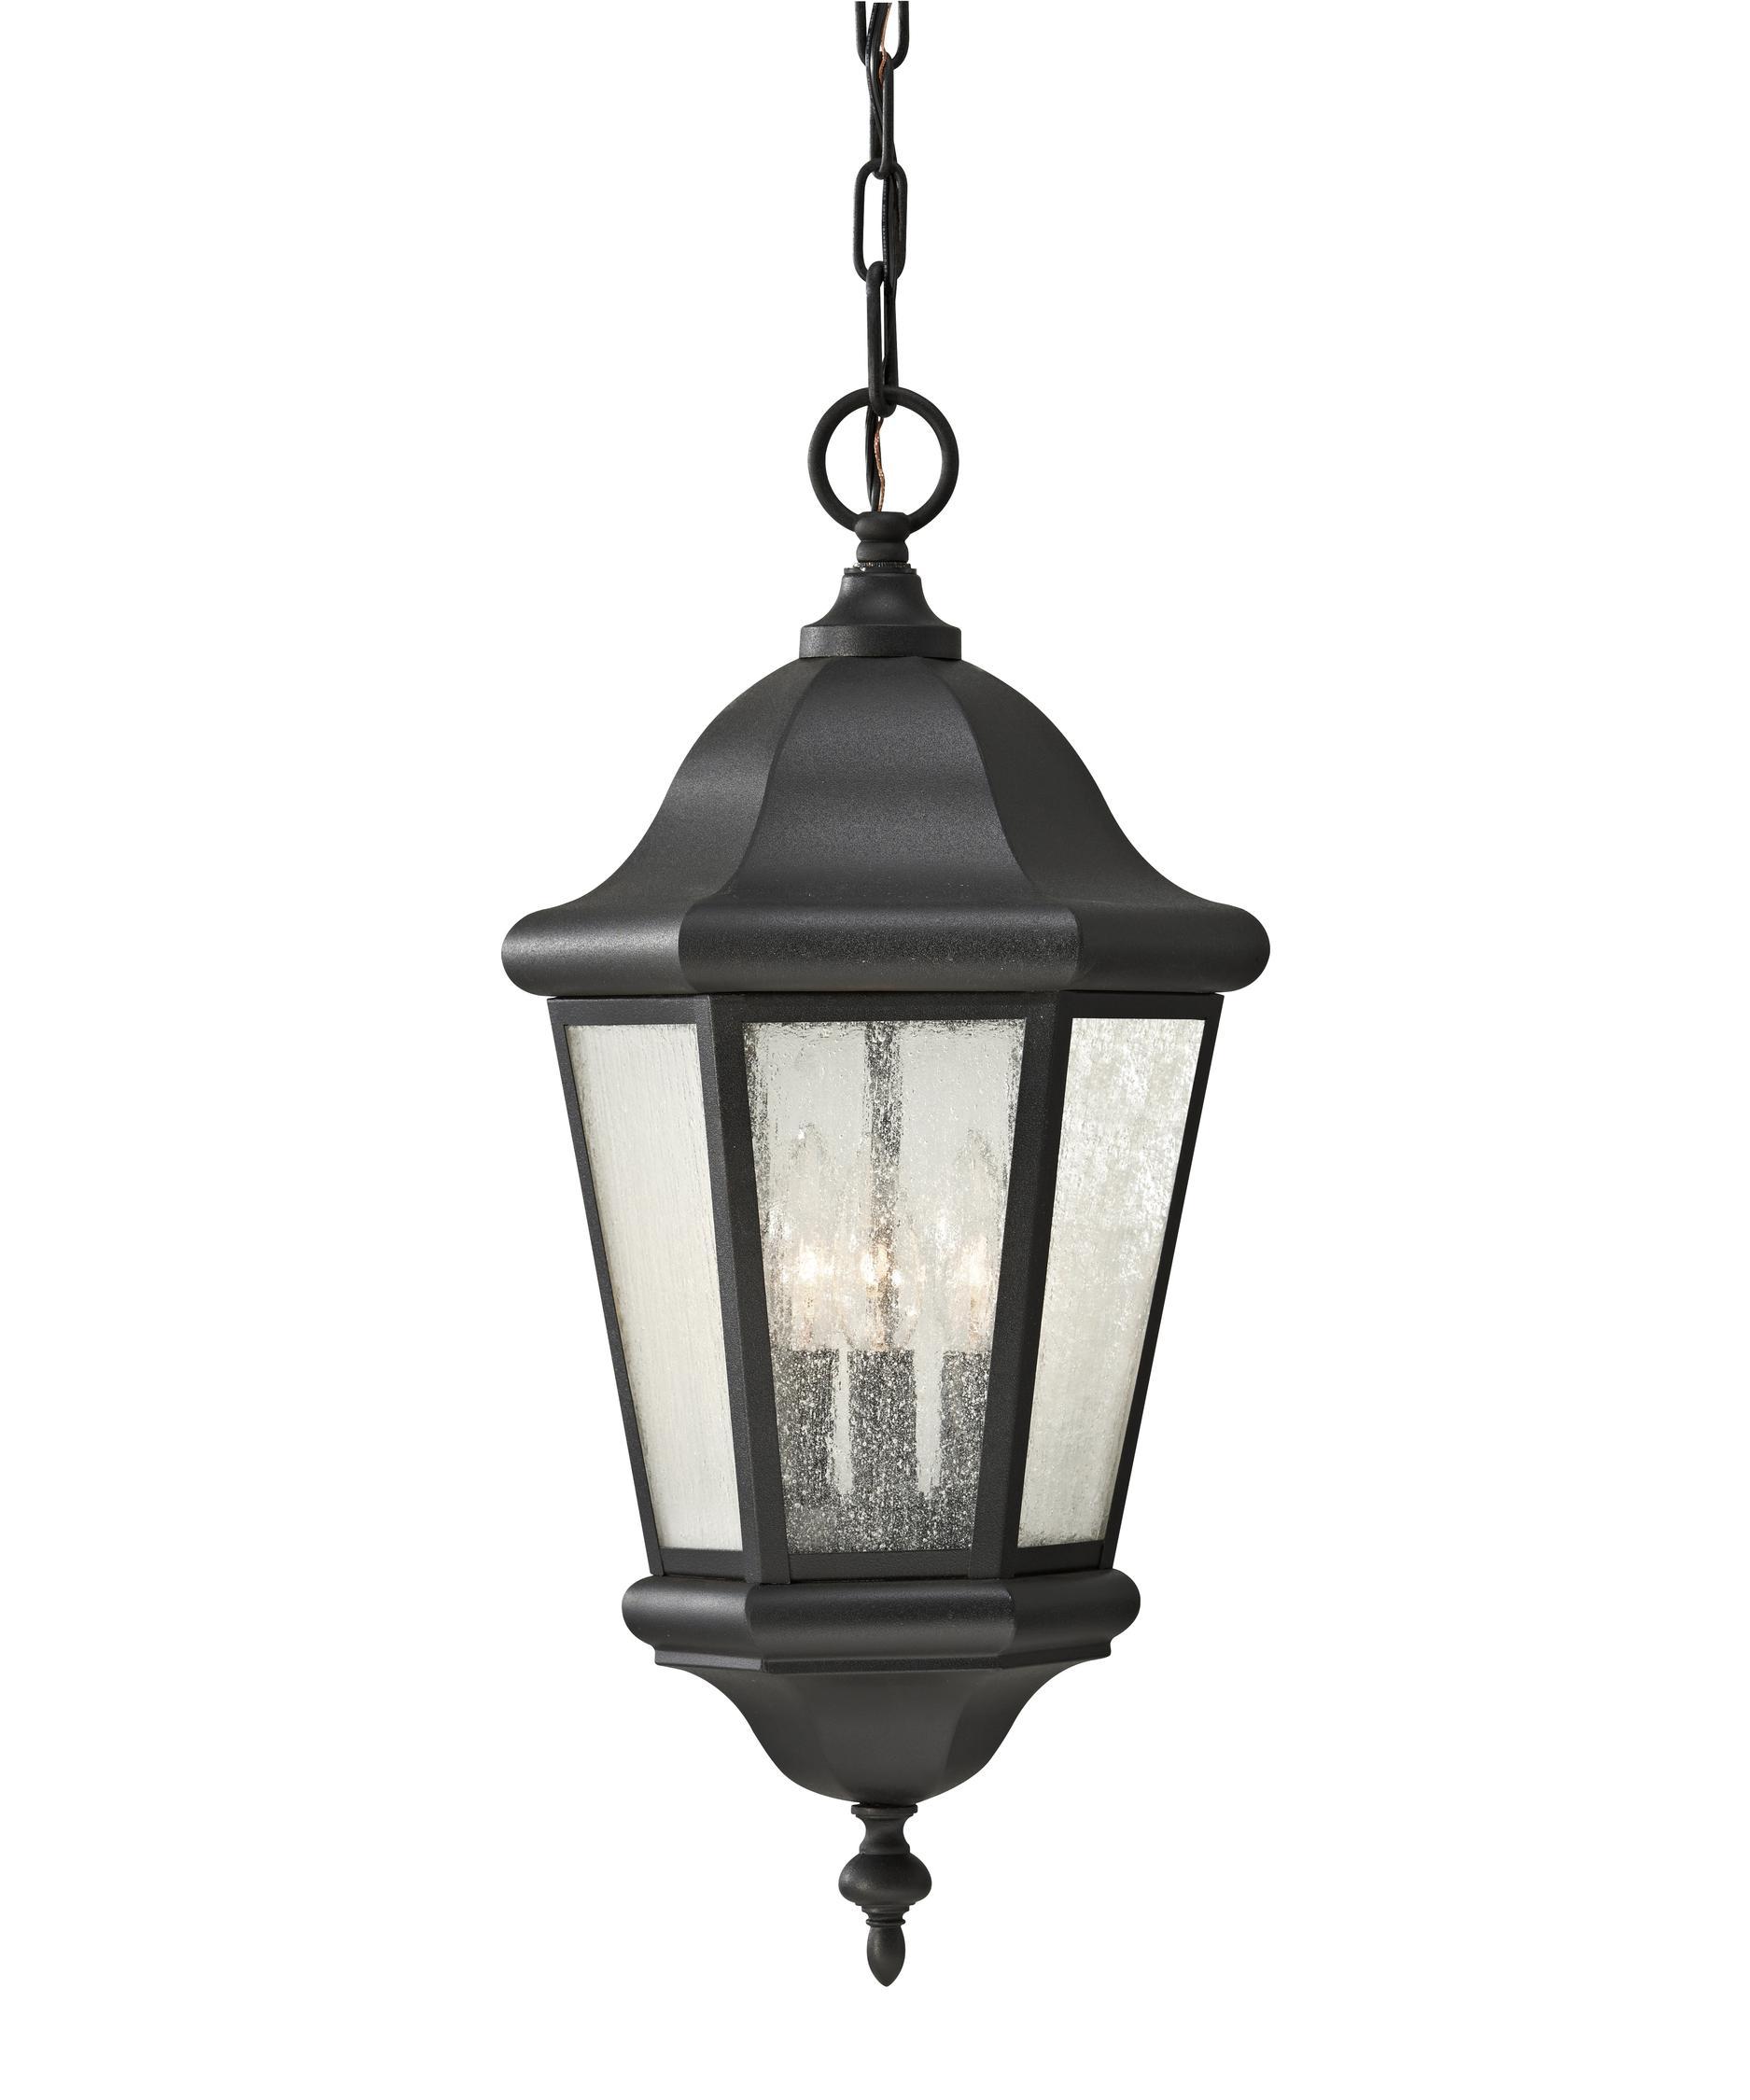 Outdoor hanging lamp - Murray Feiss Ol5911 Martinsville 10 Inch Wide 3 Light Outdoor Hanging Lantern Capitol Lighting 1 800lighting Com